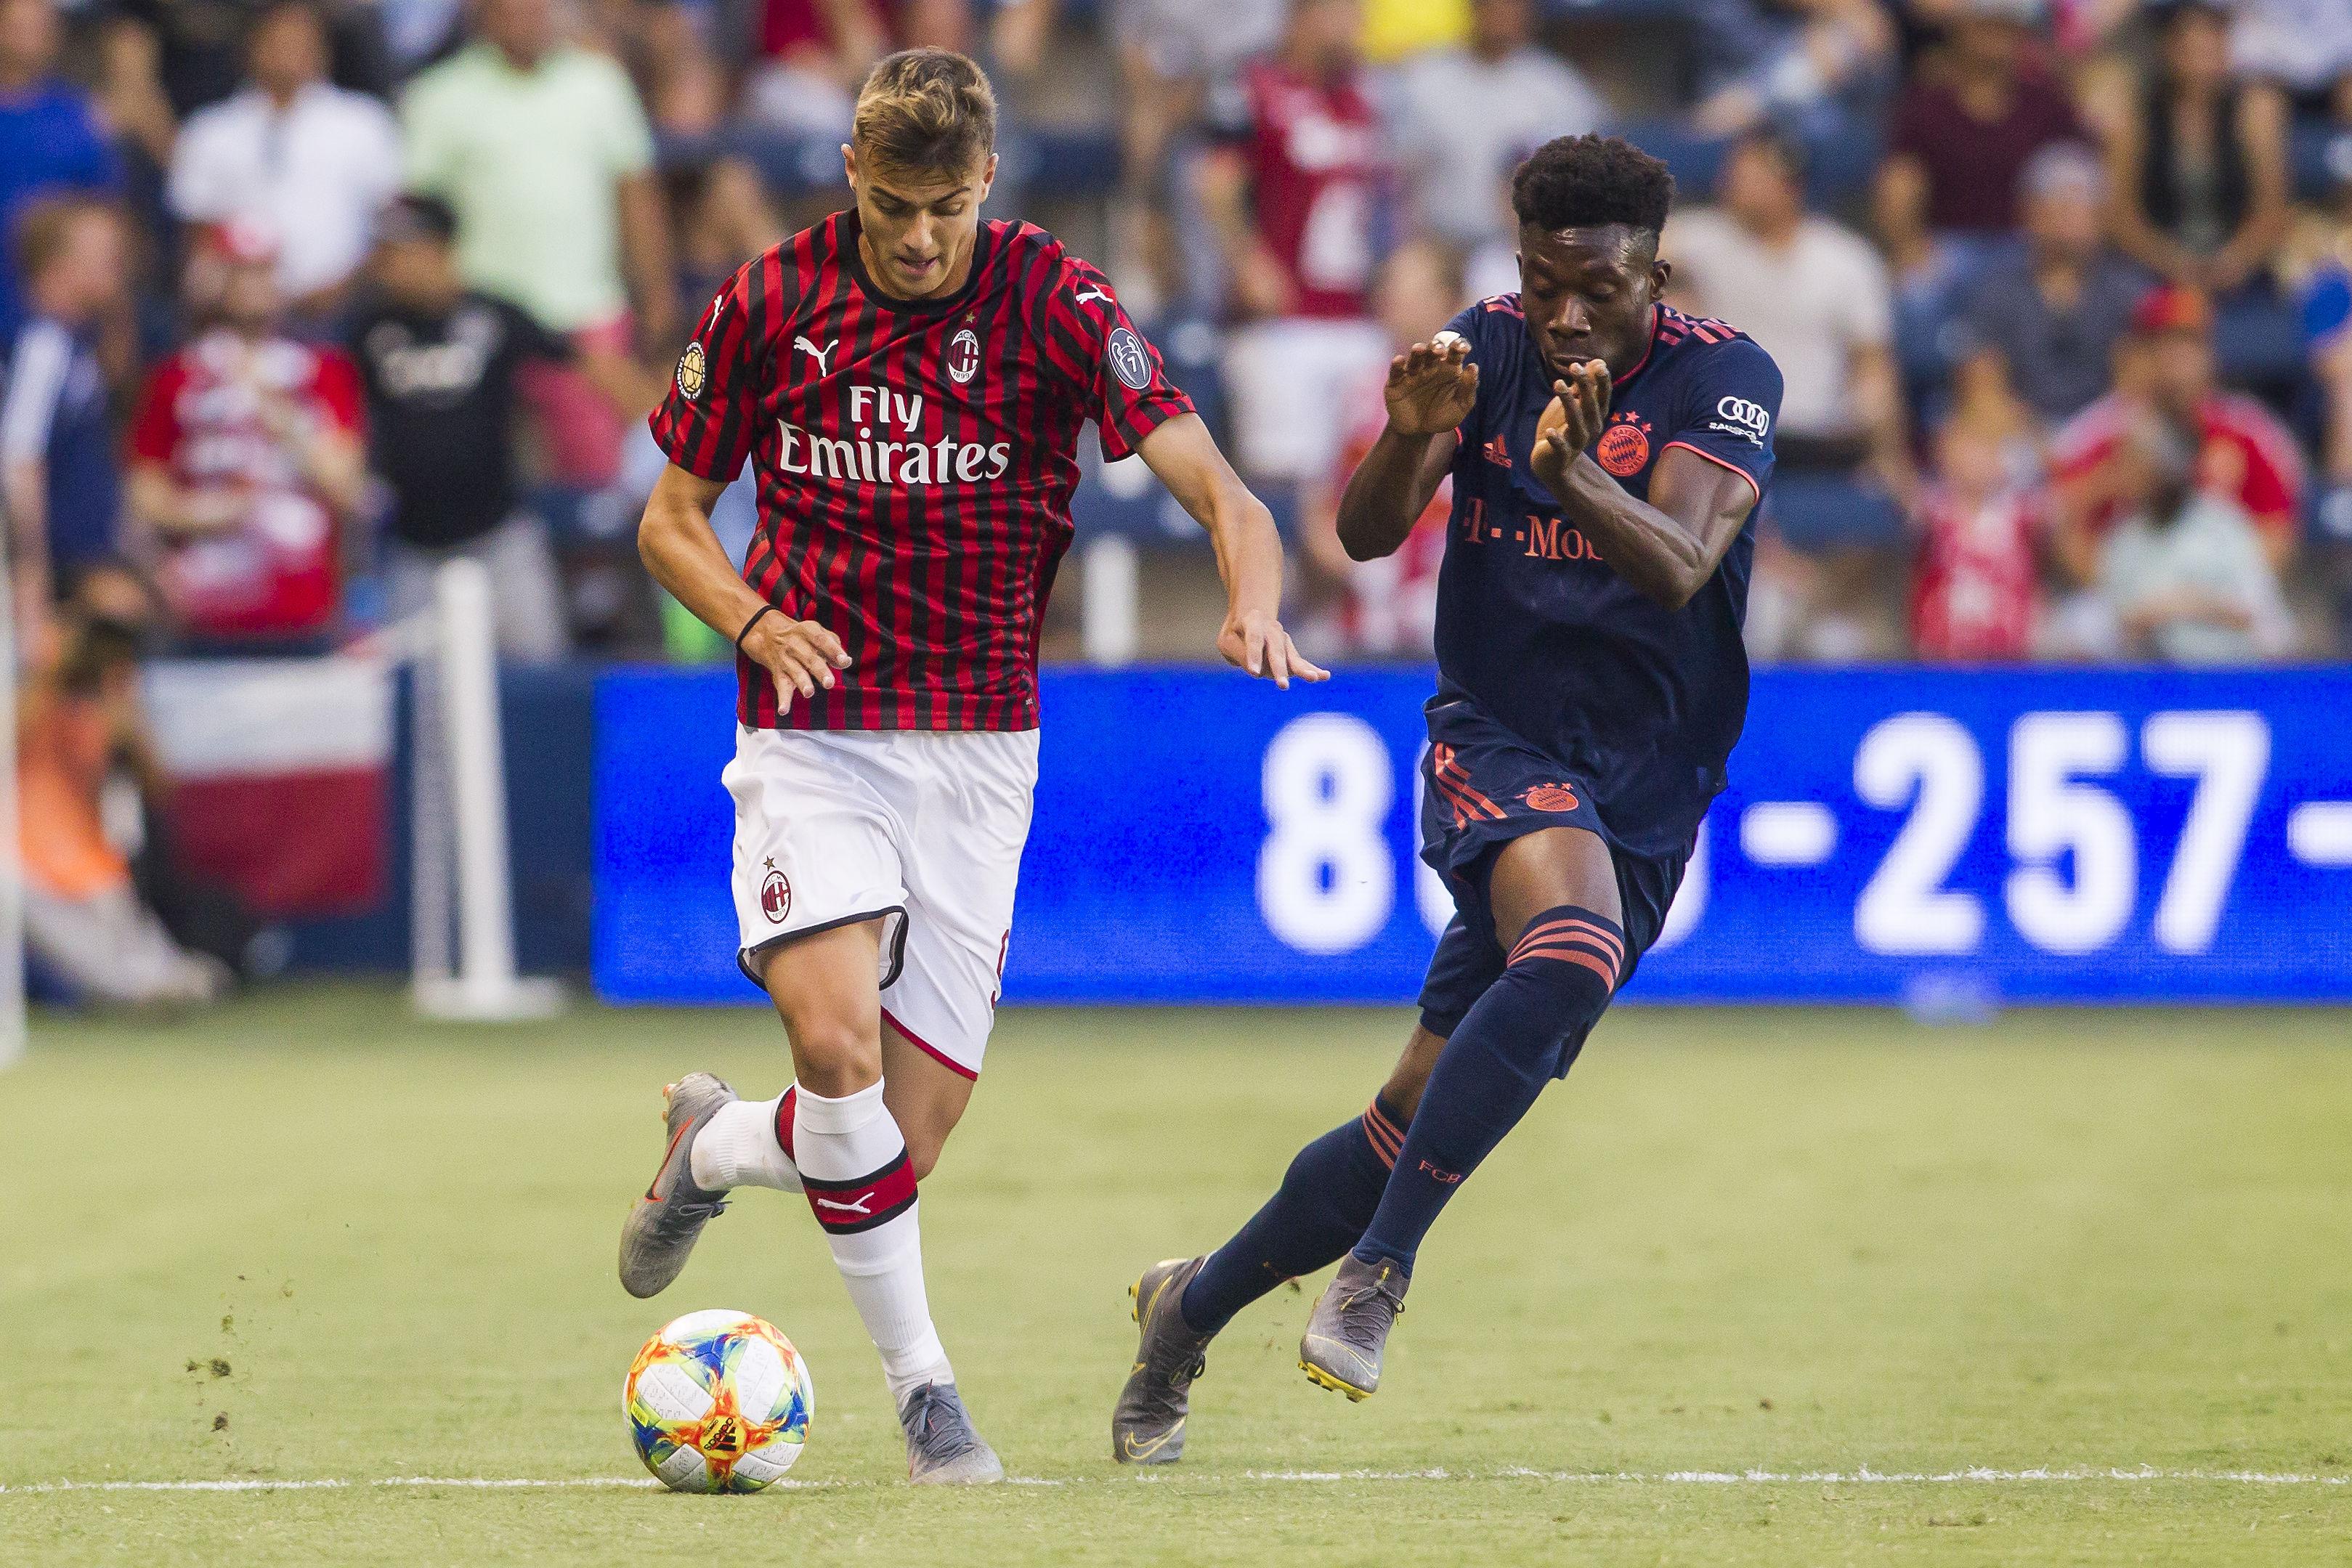 SOCCER: JUL 23 International Champions Cup - FC Bayern v AC Milan